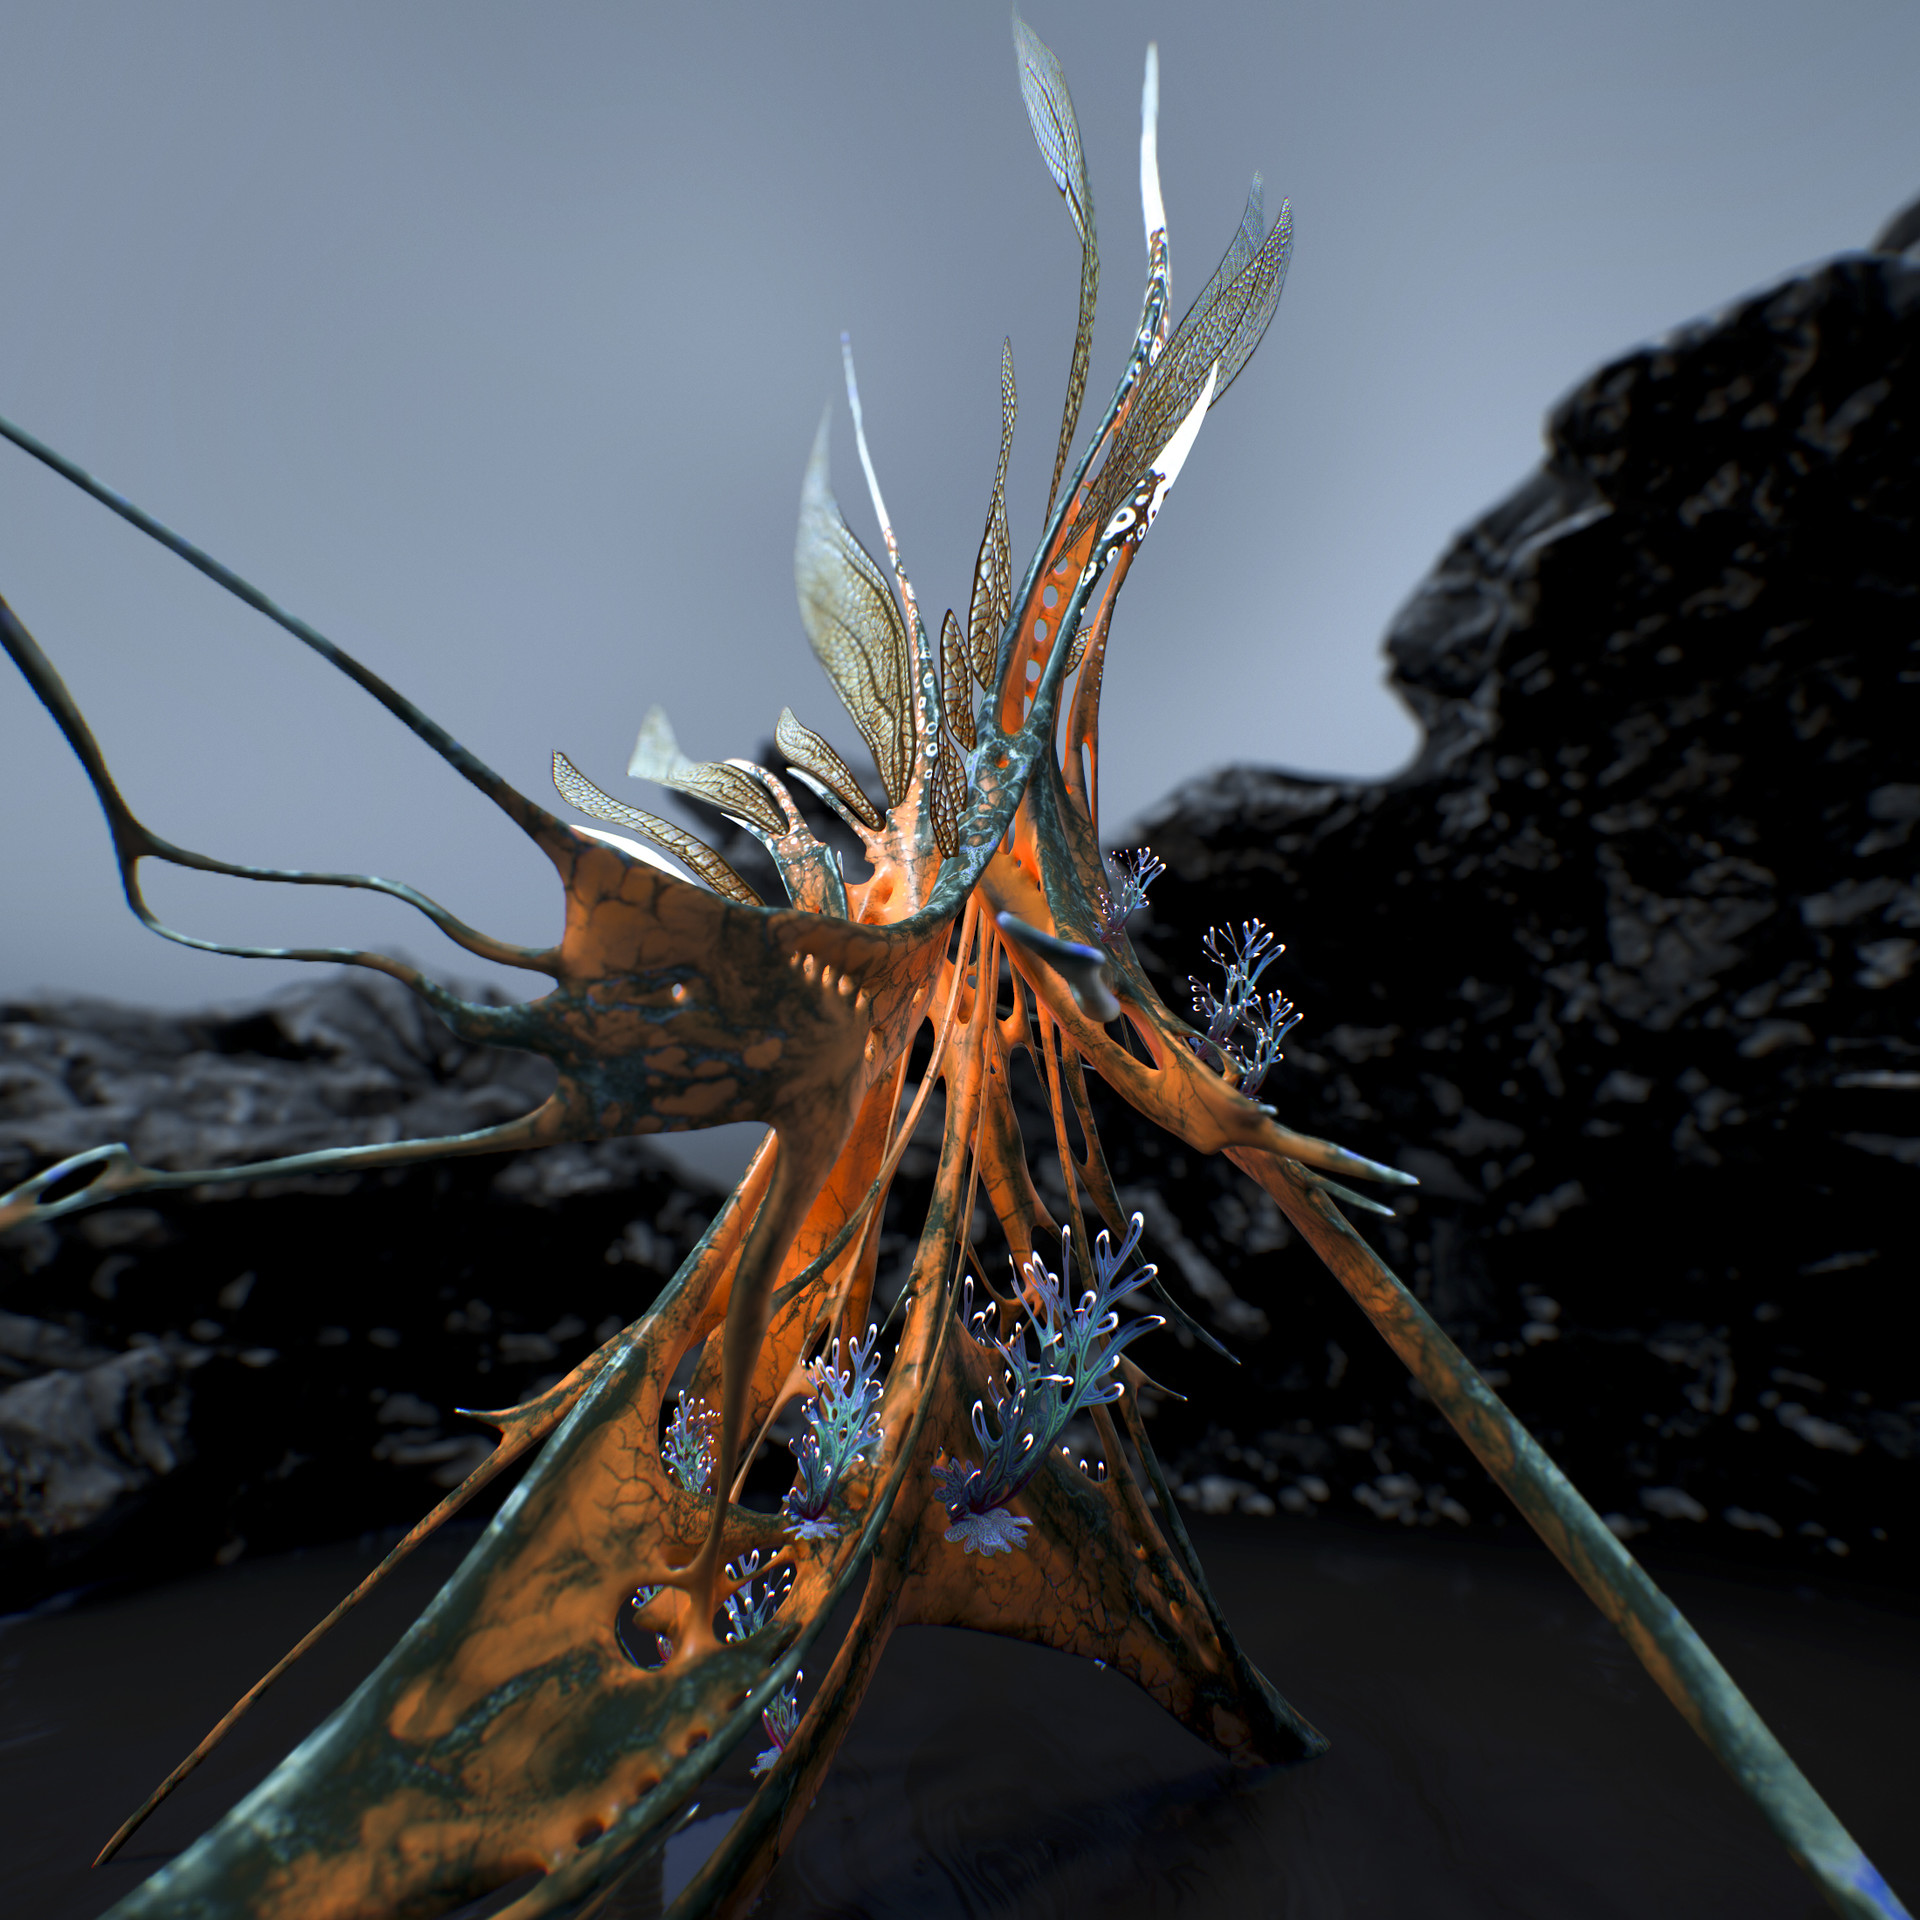 Johan de leenheer alien fern misota spletinus38